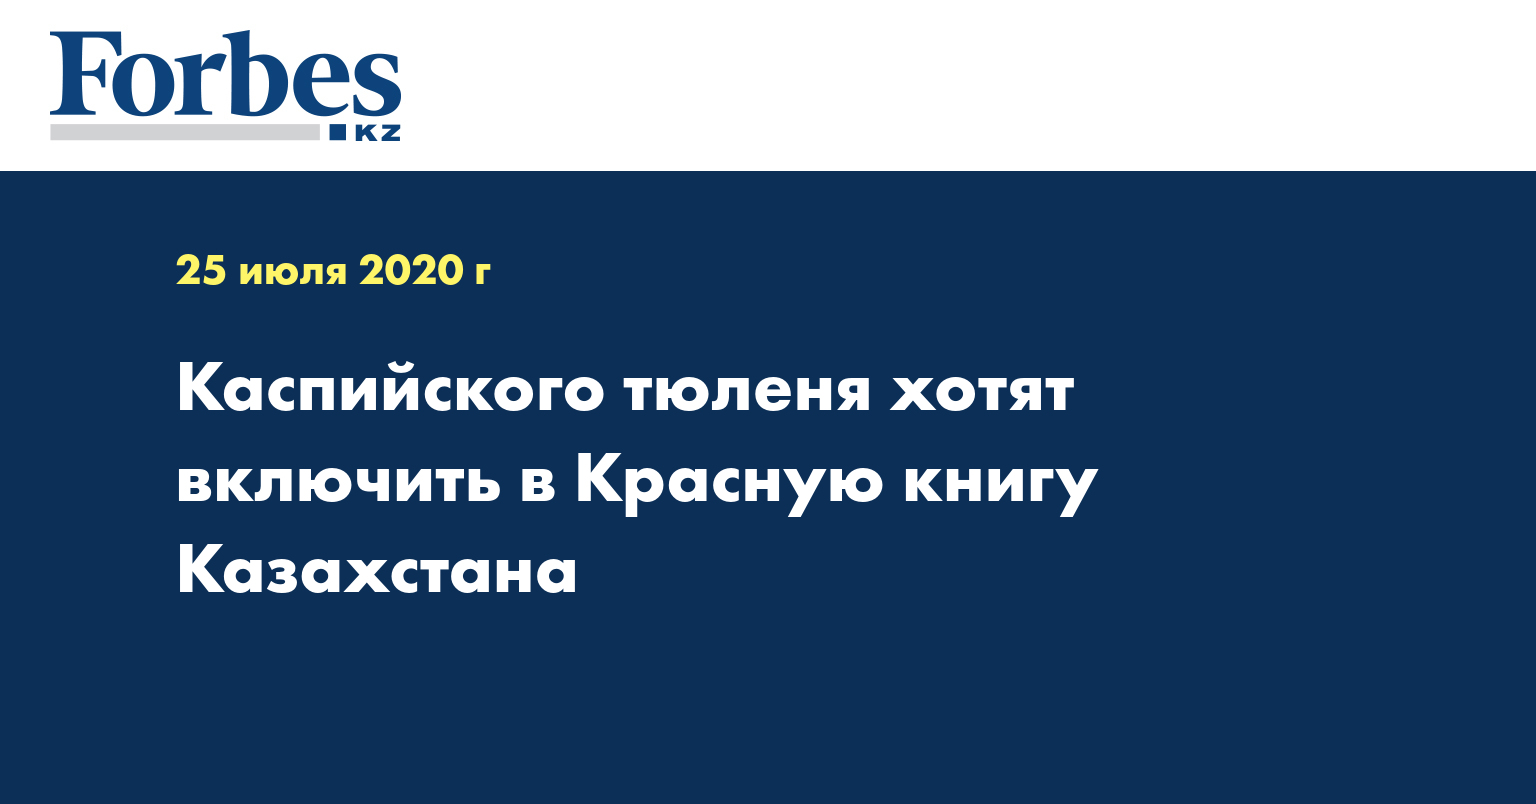 Каспийского тюленя хотят включить в Красную книгу Казахстана